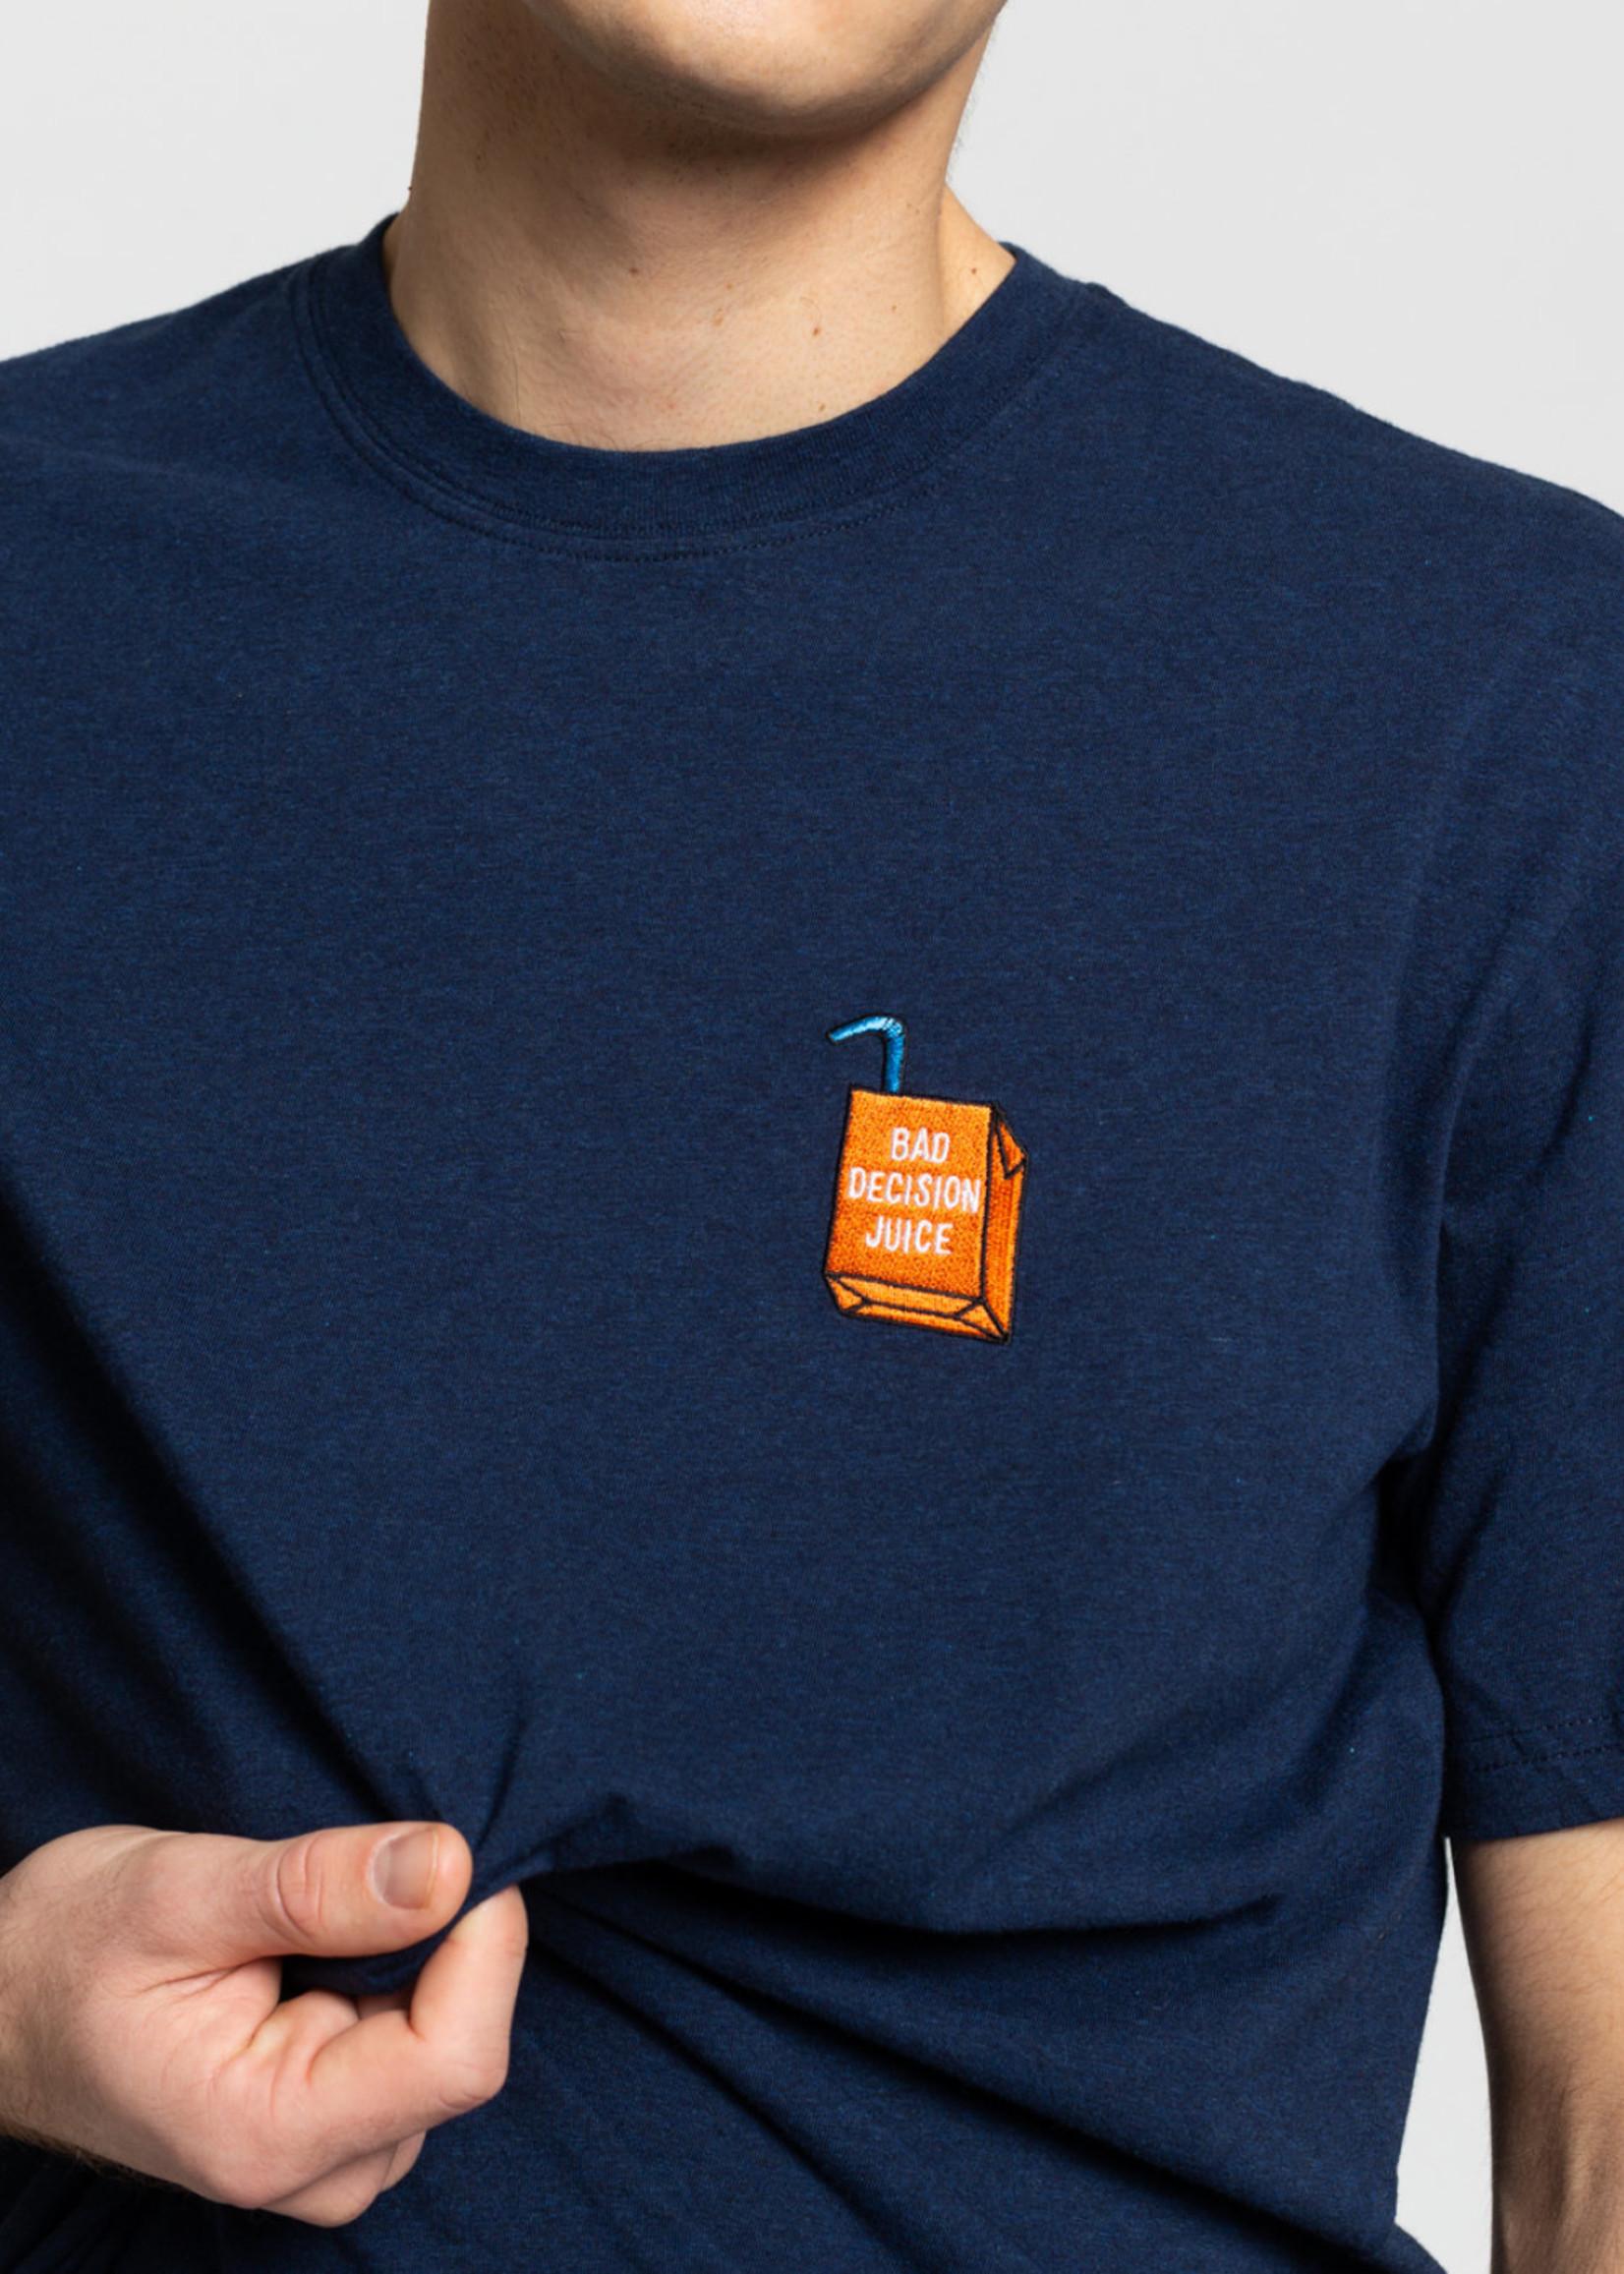 Revolution 1234 JUI Loose T-Shirt